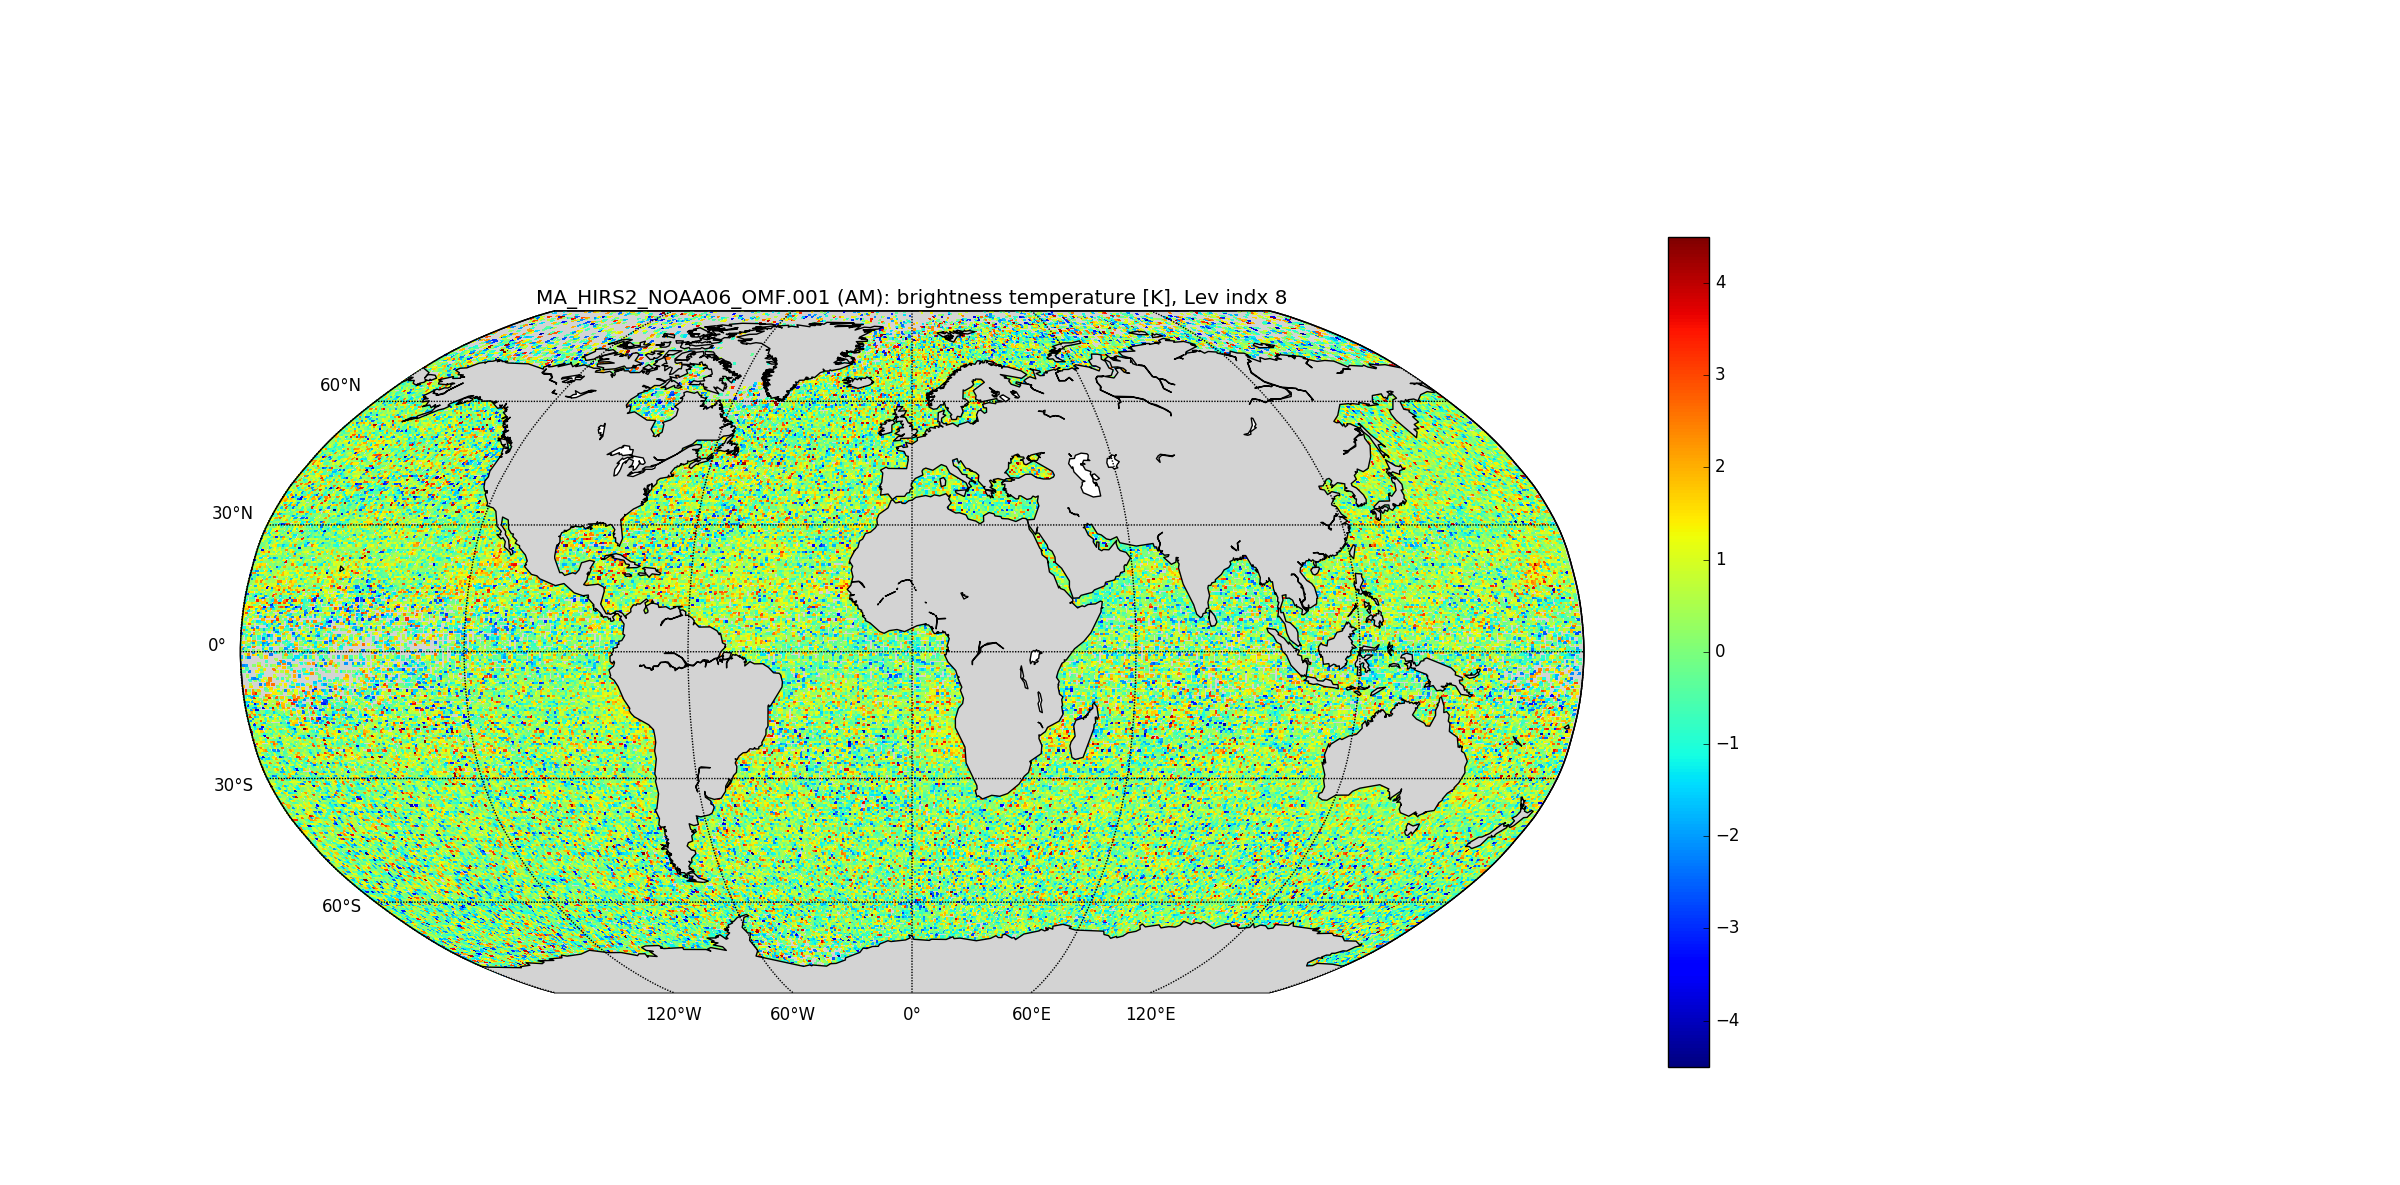 MA_HIRS2_NOAA06_OMF variable